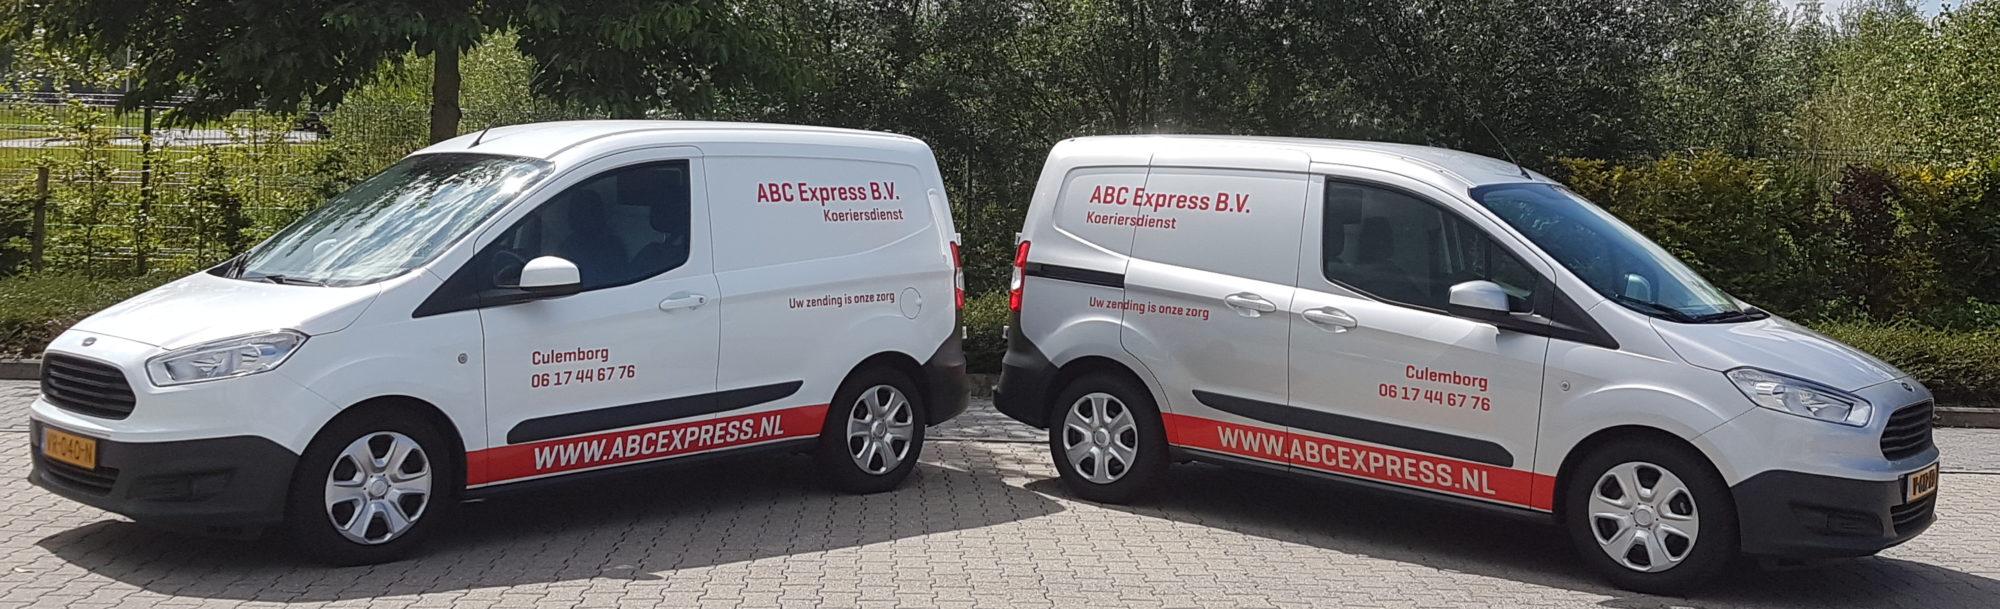 ABC Express BV